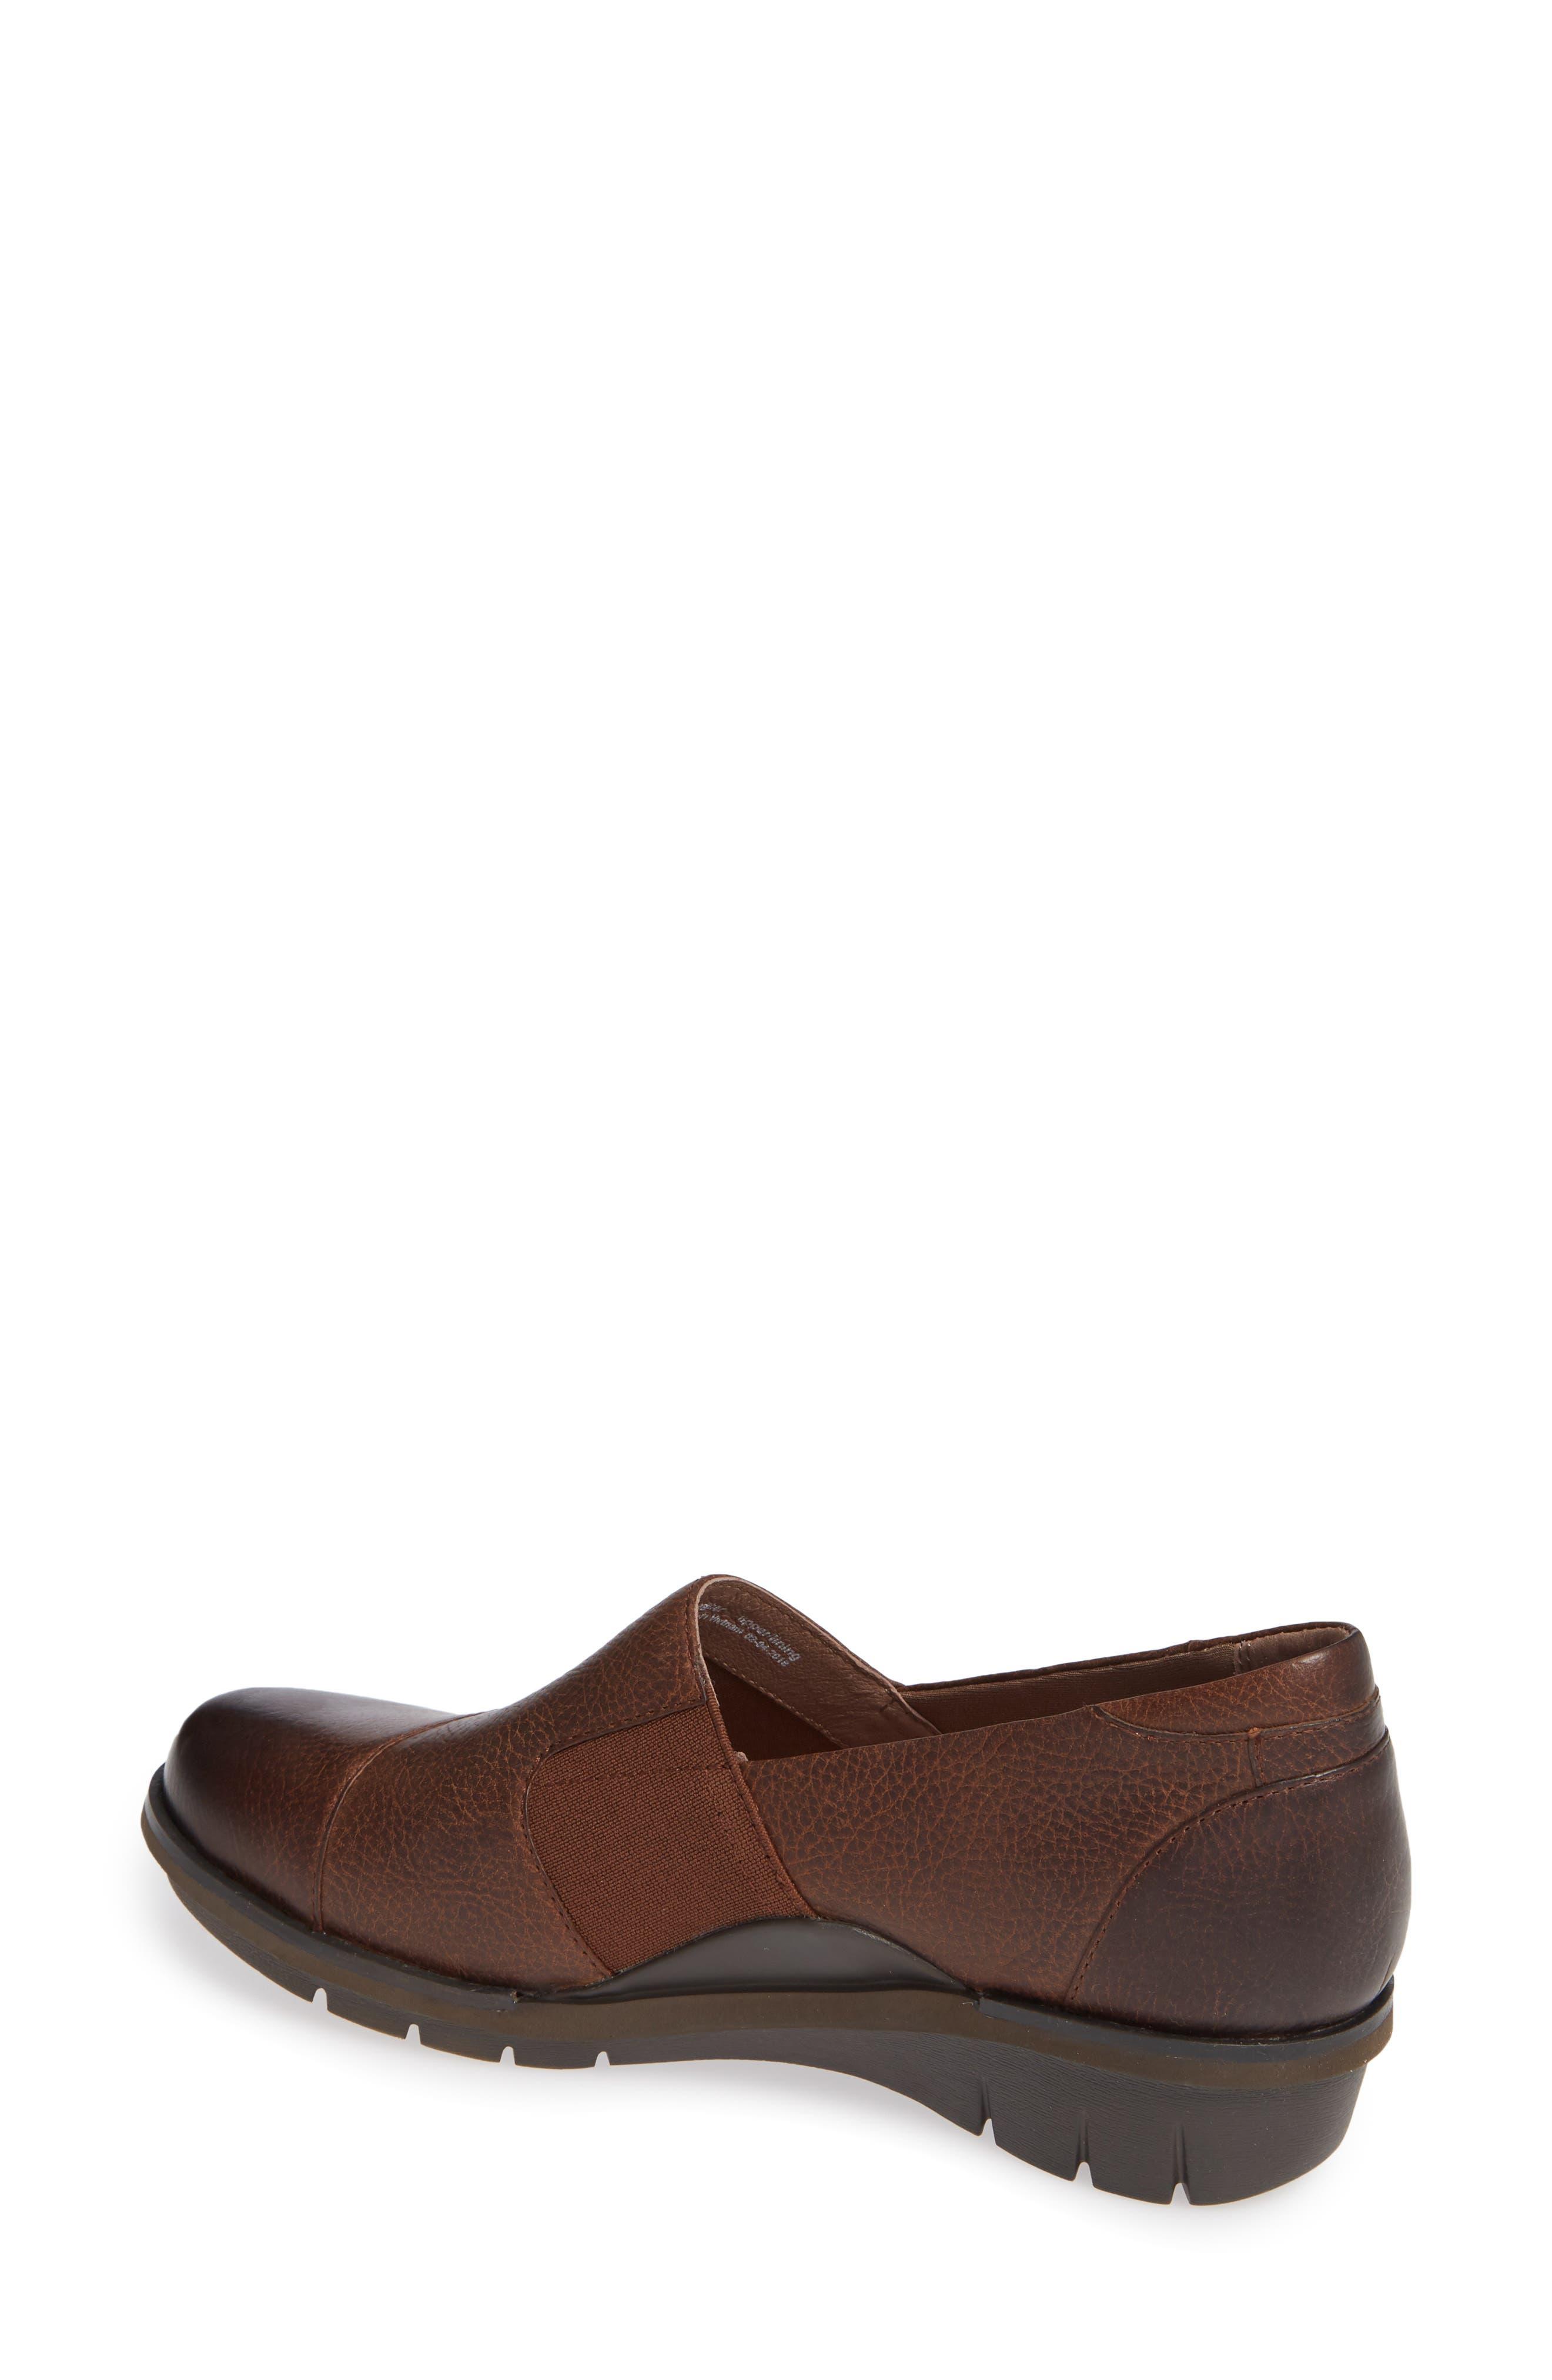 Dankso Julia Wedge Slip-On,                             Alternate thumbnail 2, color,                             Brown Burnished Nubuck Leather